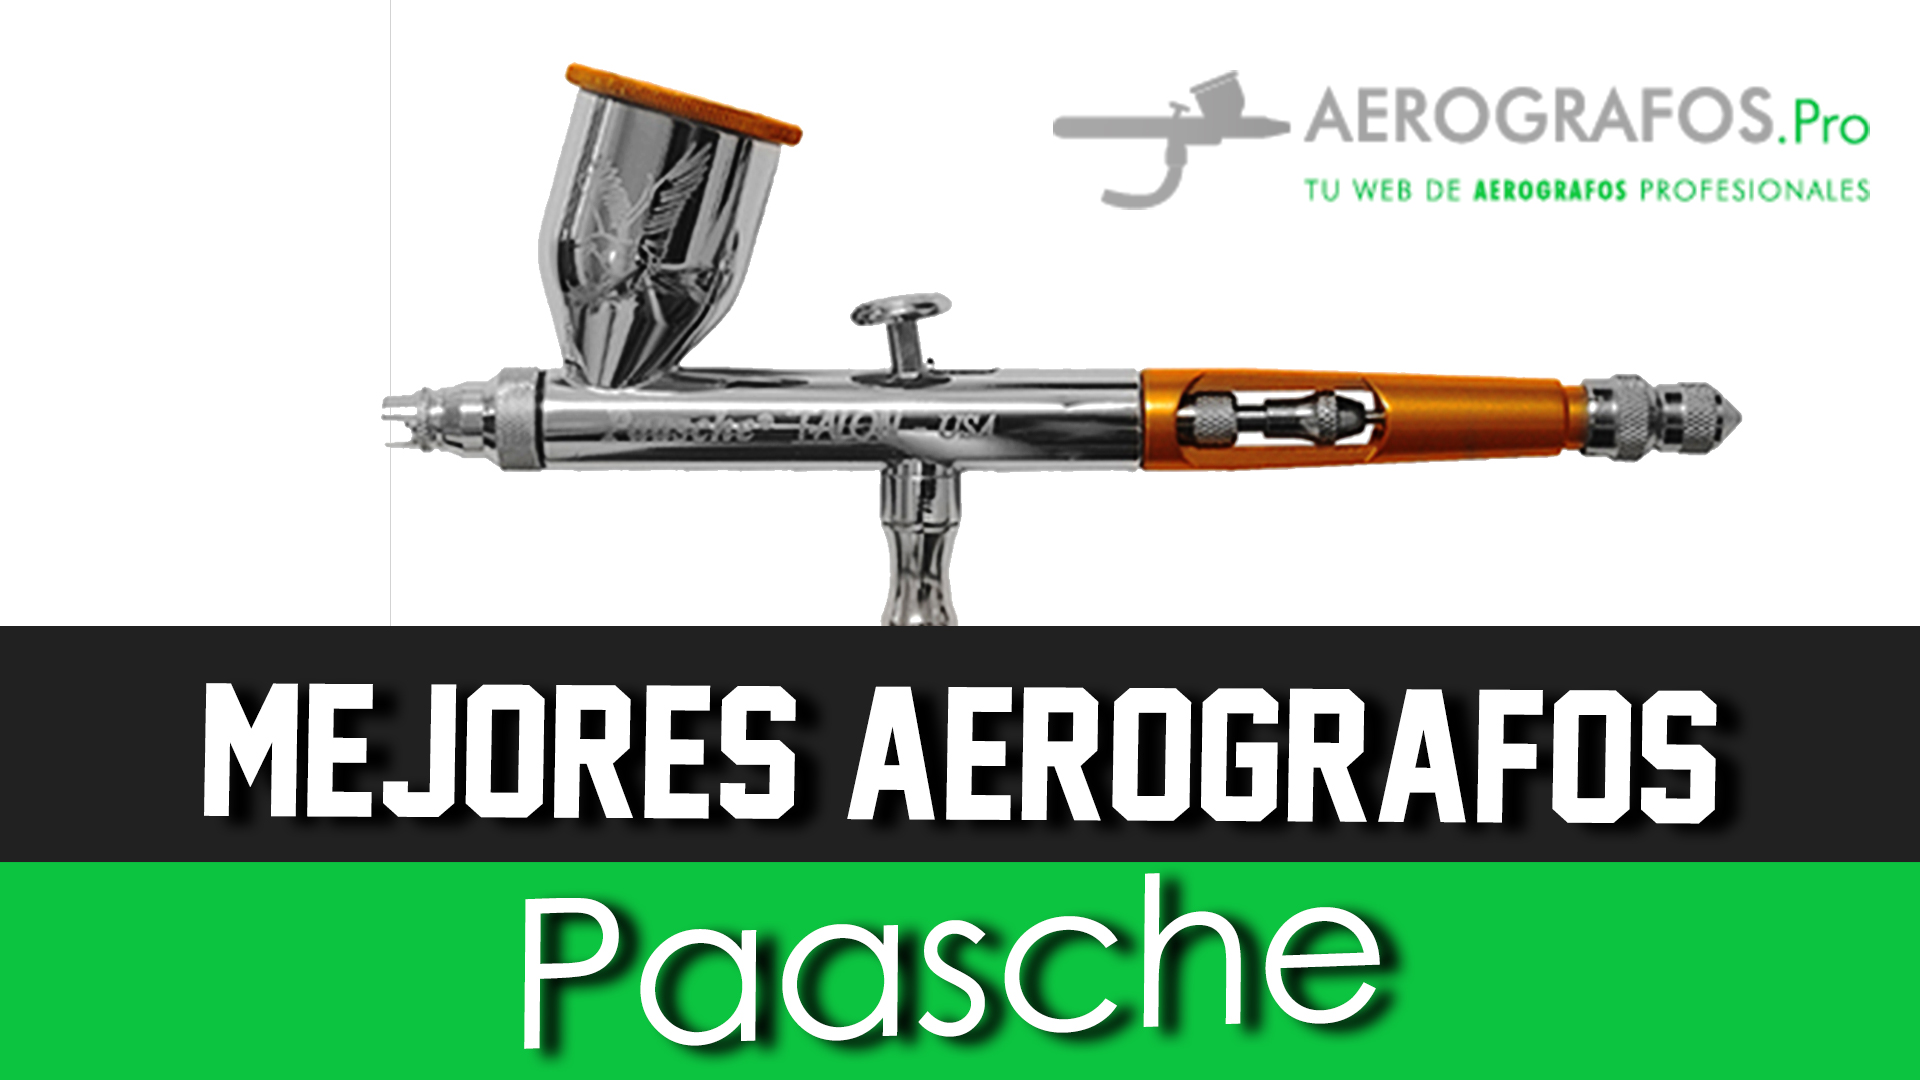 Aerografo Paasche